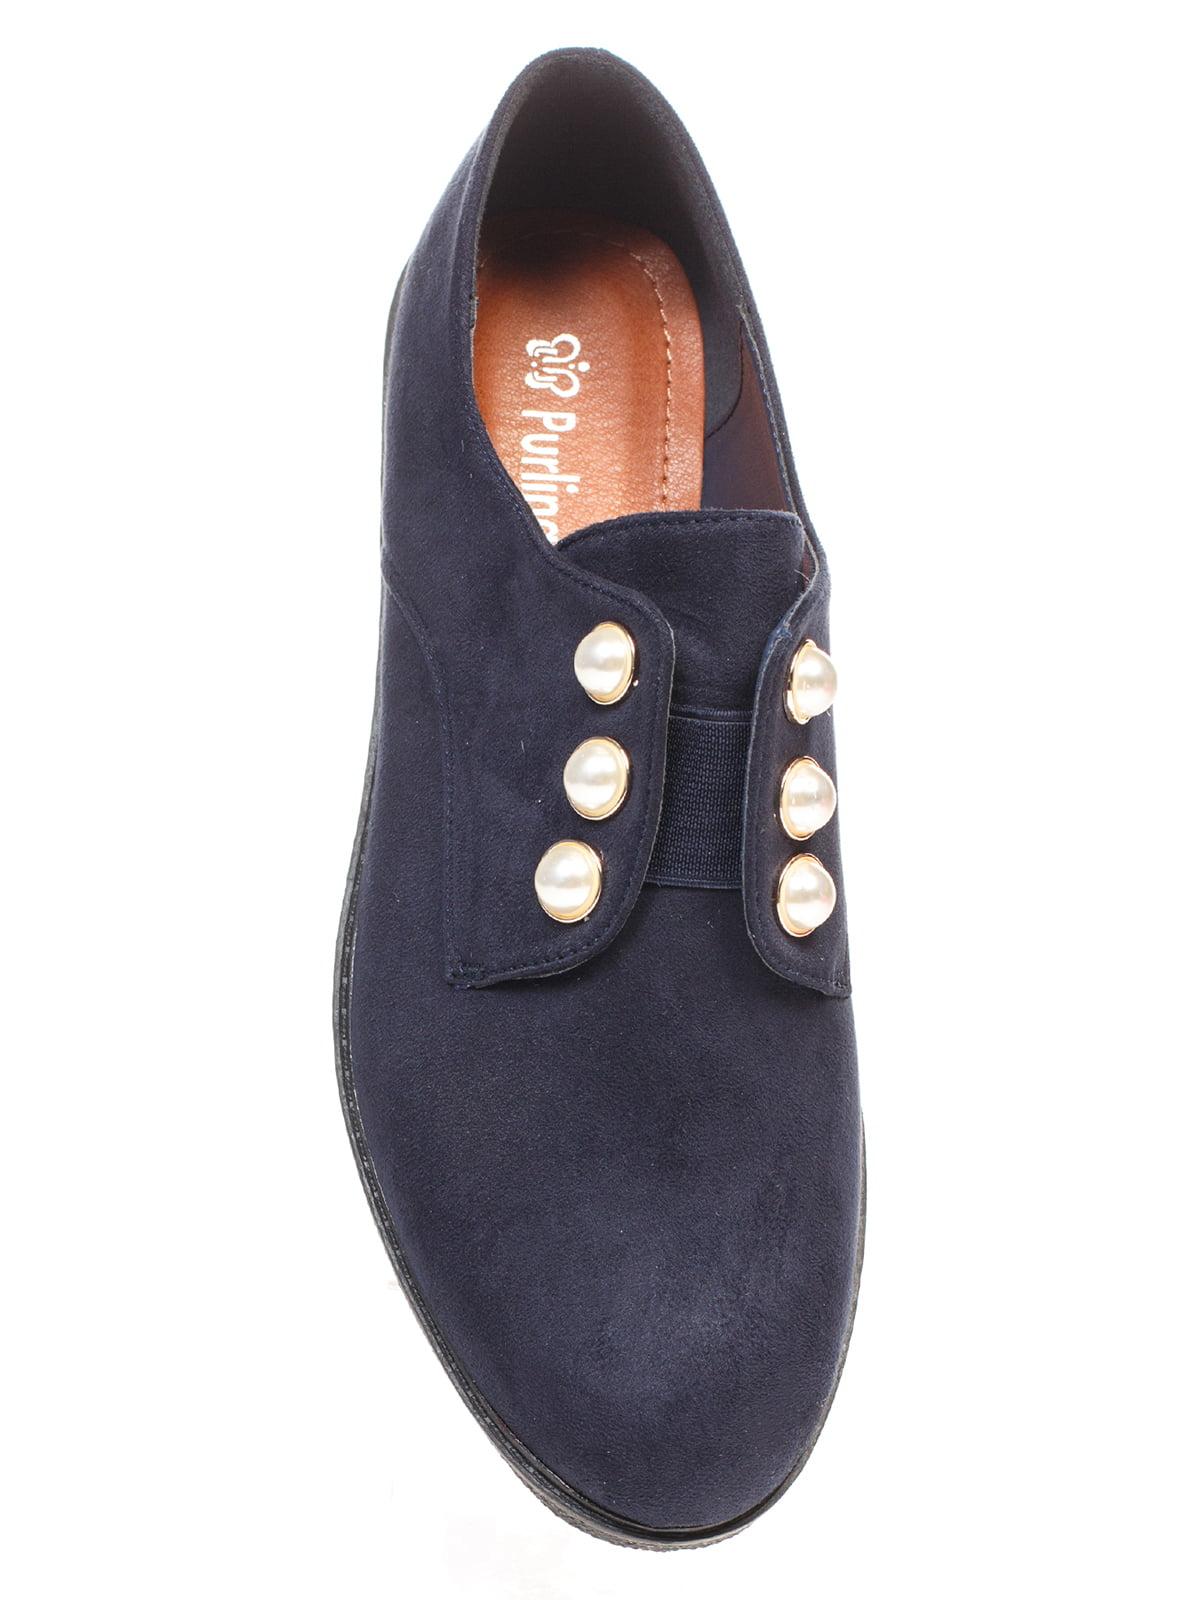 Туфли синие с декором | 4605868 | фото 4